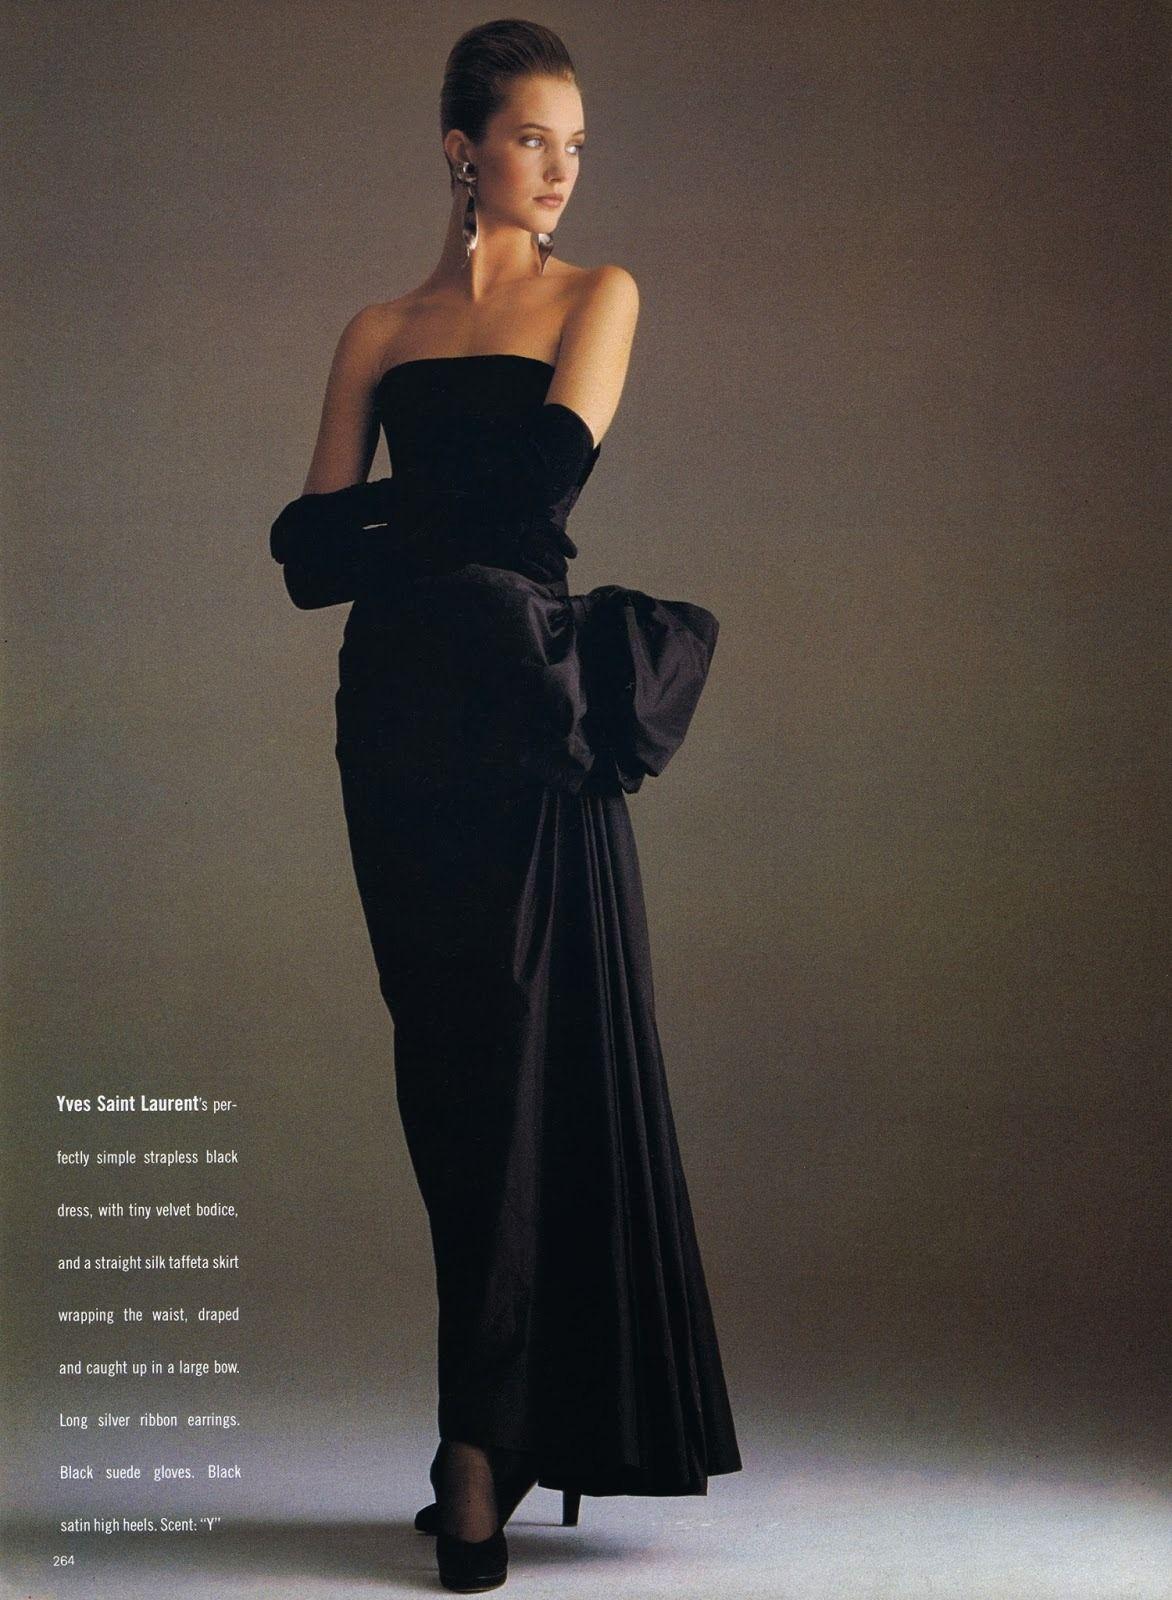 Abiti Da Sera Yves Saint Laurent.Abito Da Sera Yves Saint Laurent 1988 Fashion Dresses Glamour